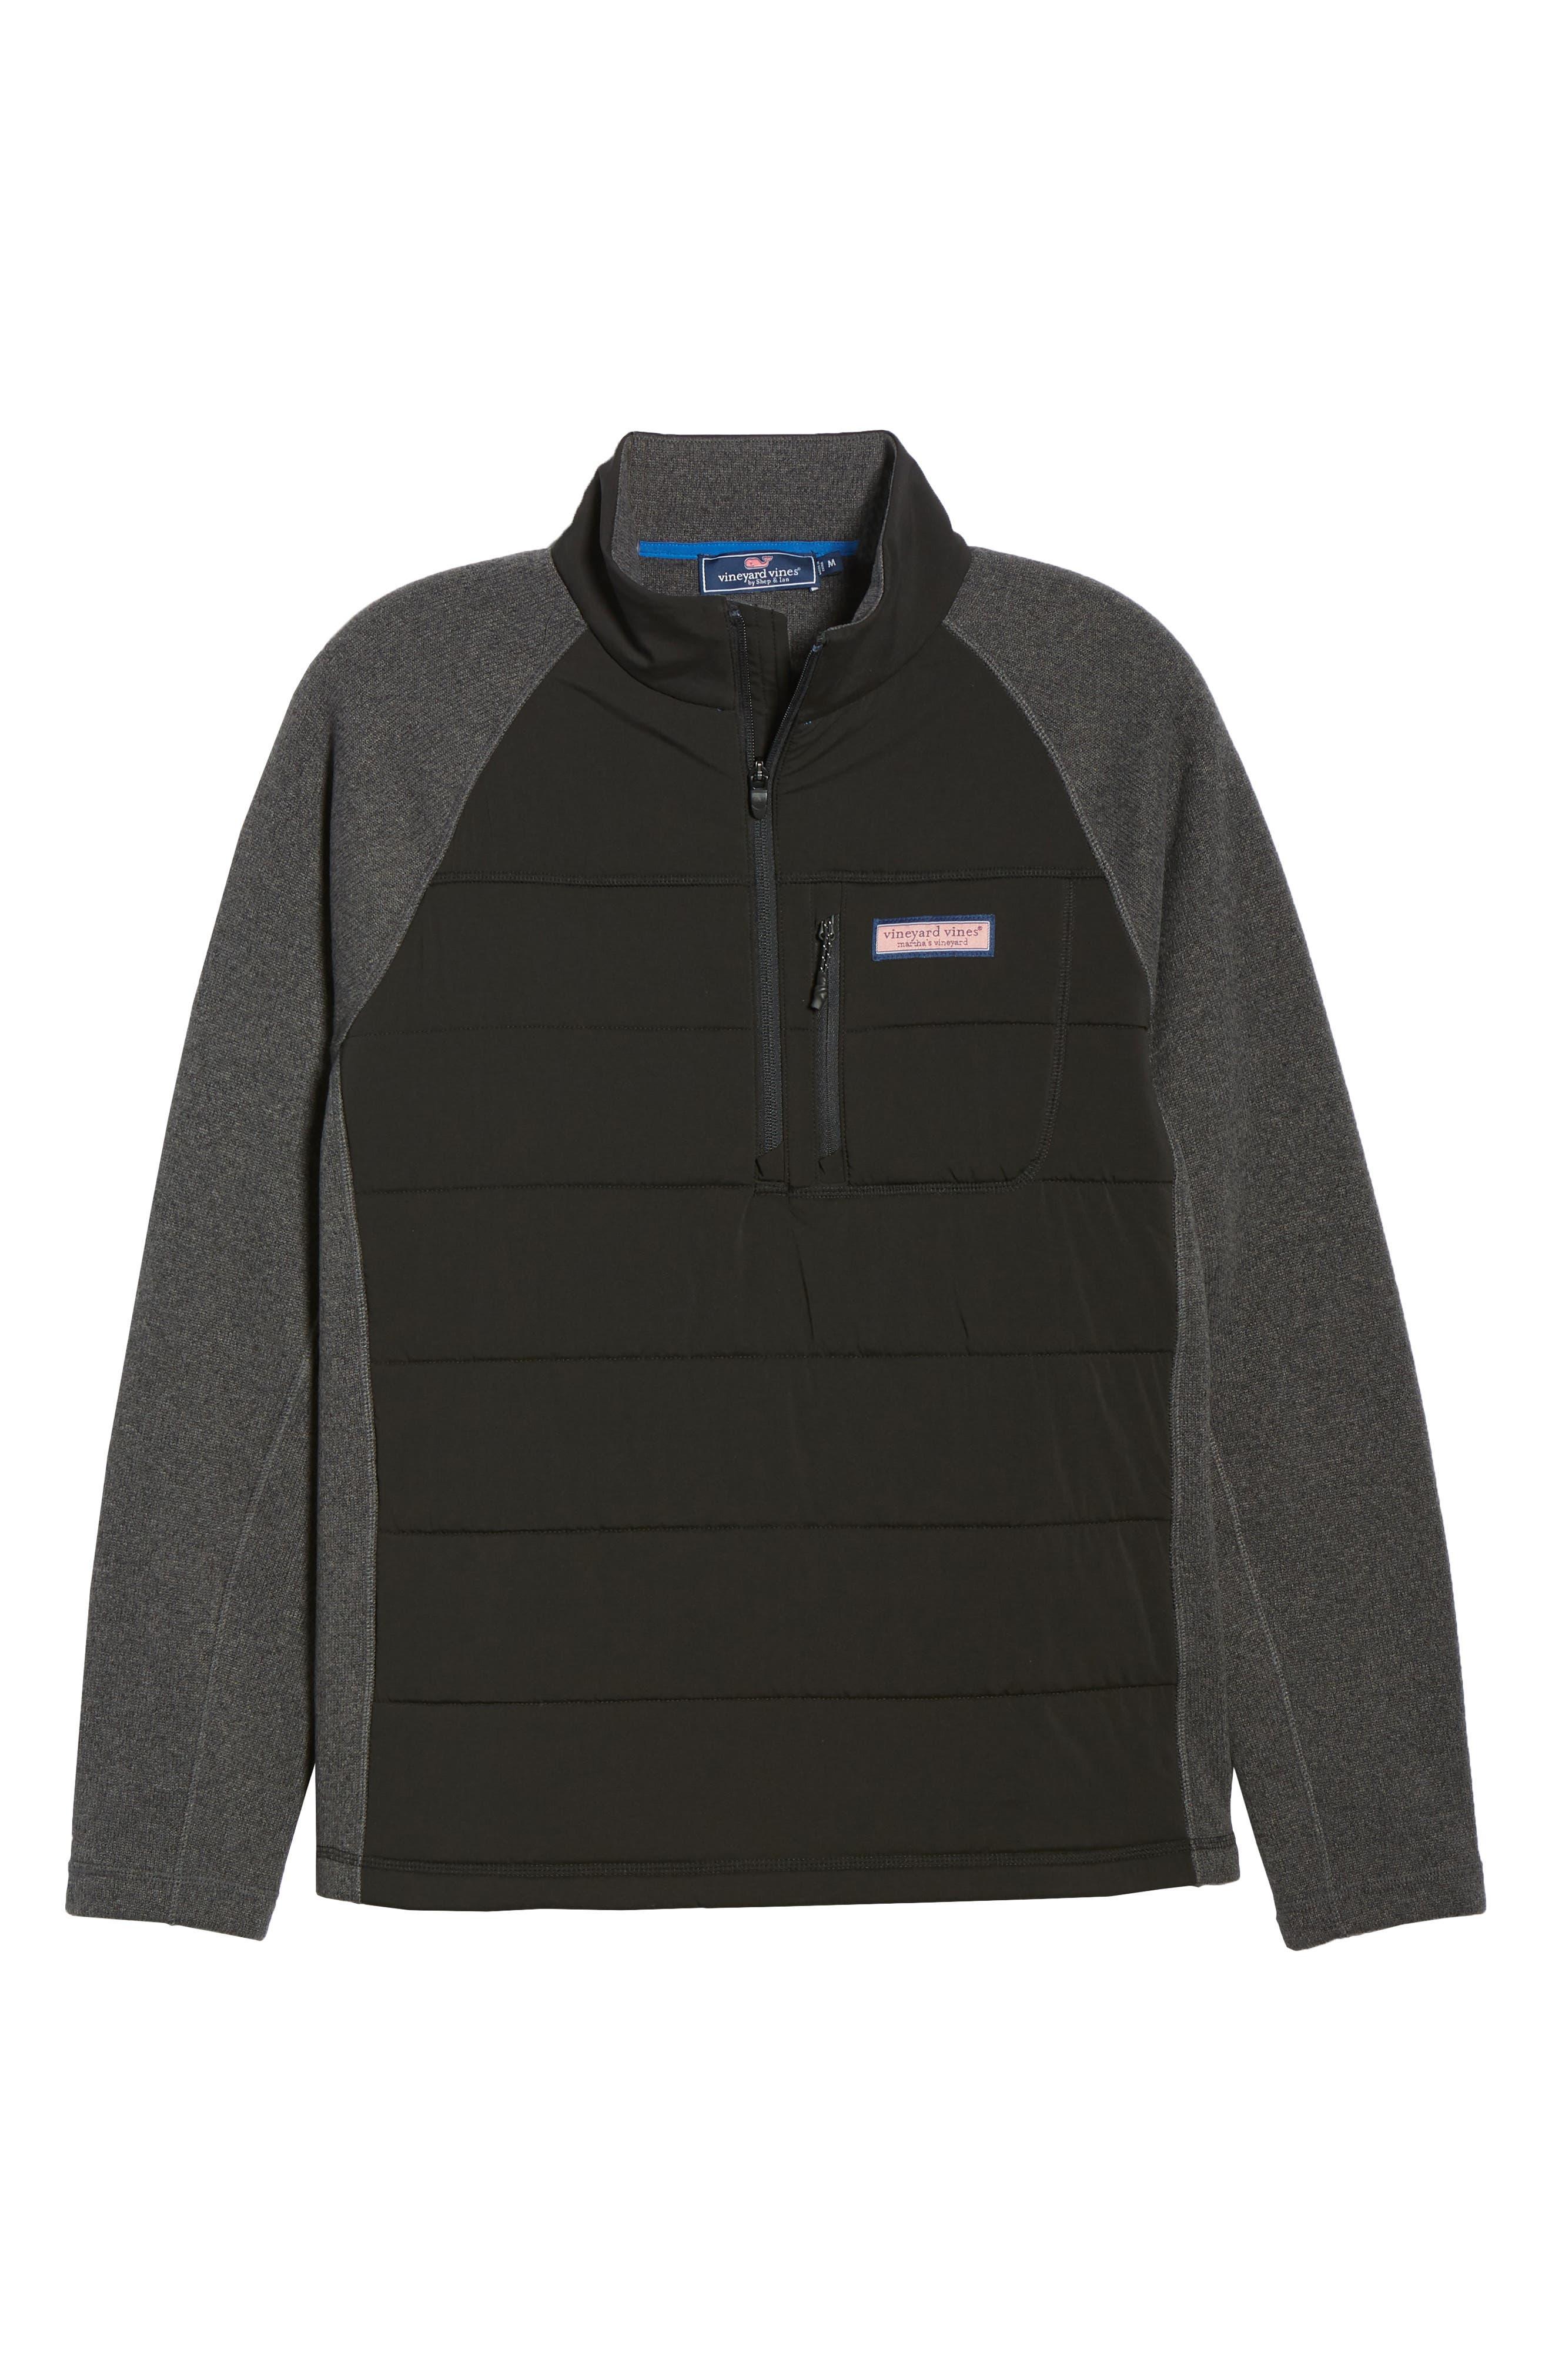 Seaward Fleece Half Zip Pullover,                             Alternate thumbnail 7, color,                             NOCTURNE